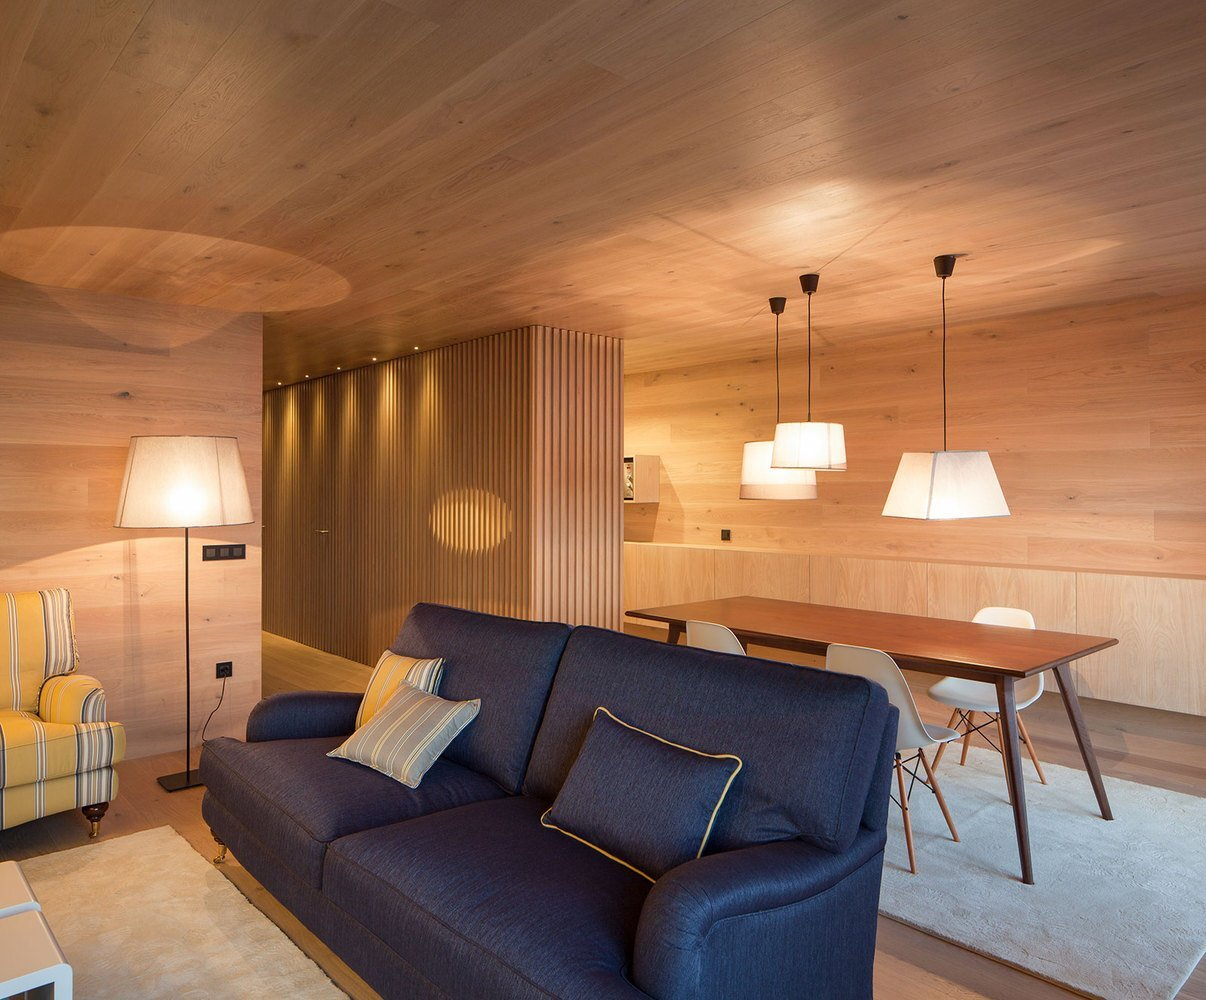 Apartment at Póvoa do Varzim - Pitagoras Group - Portugal - Living Area - Humble Homes